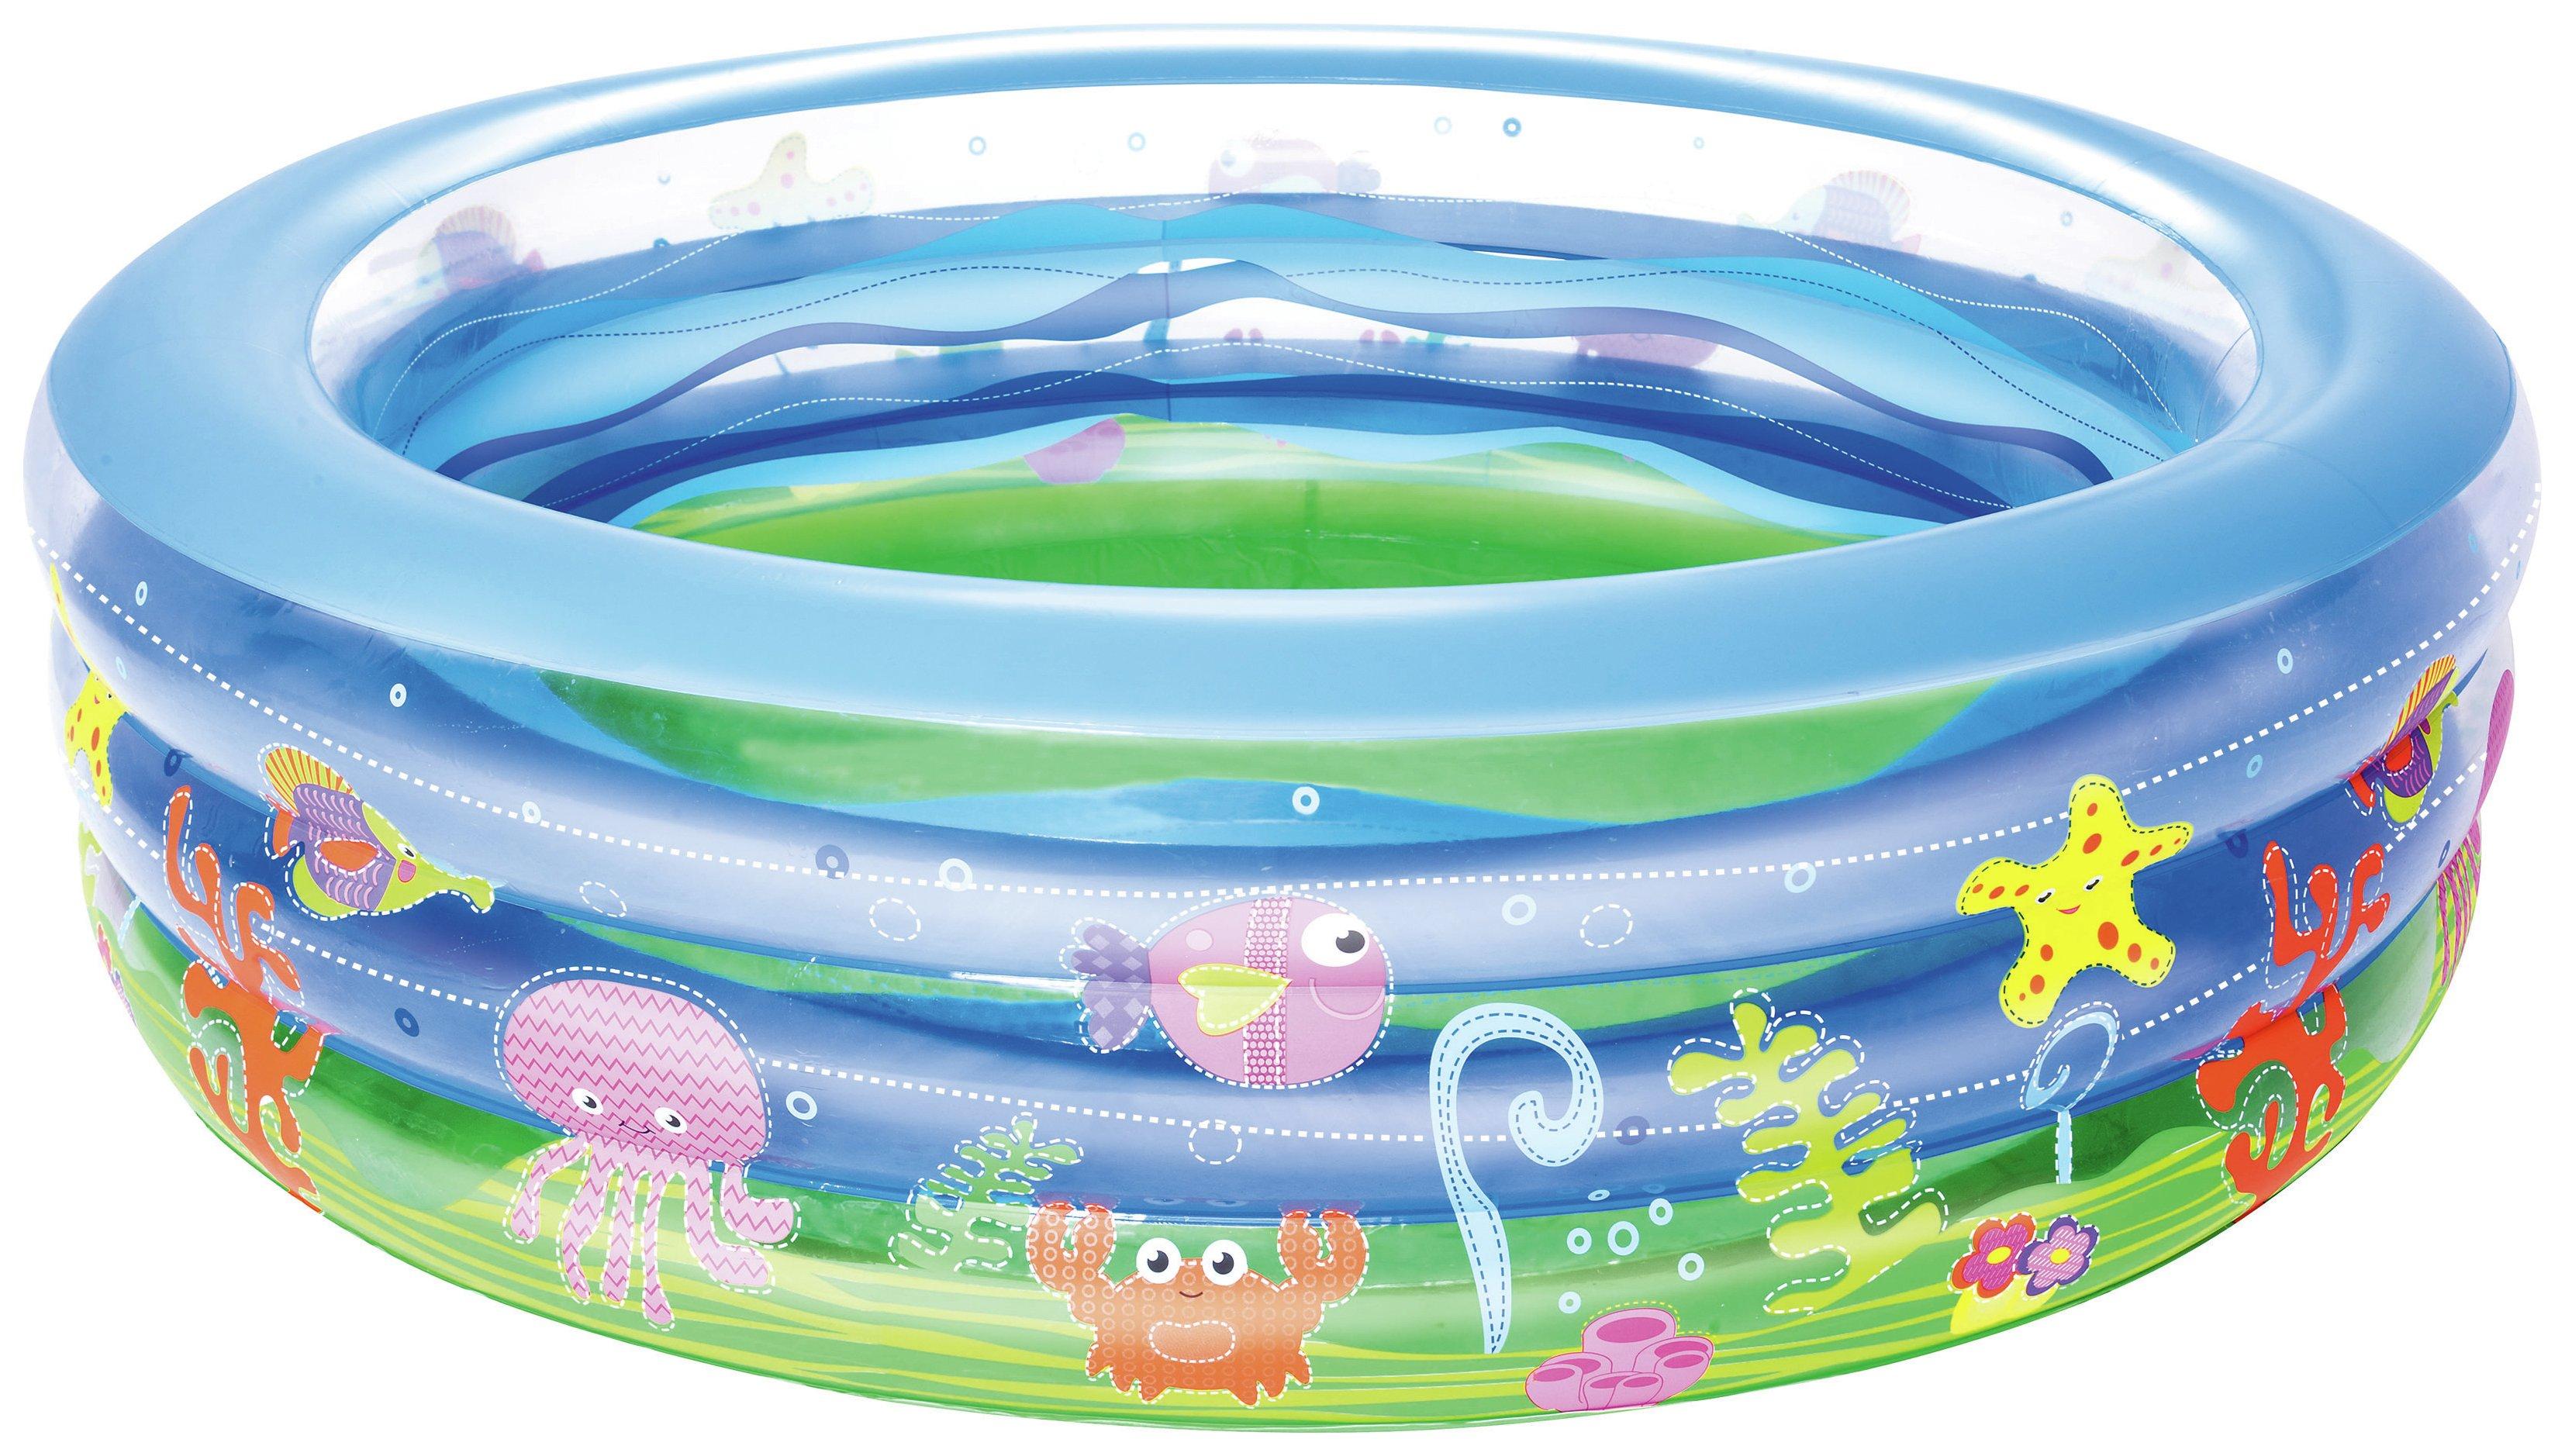 Image of Bestway Summer Wave Crystal Pool - 6.5ft - 700 Litres.